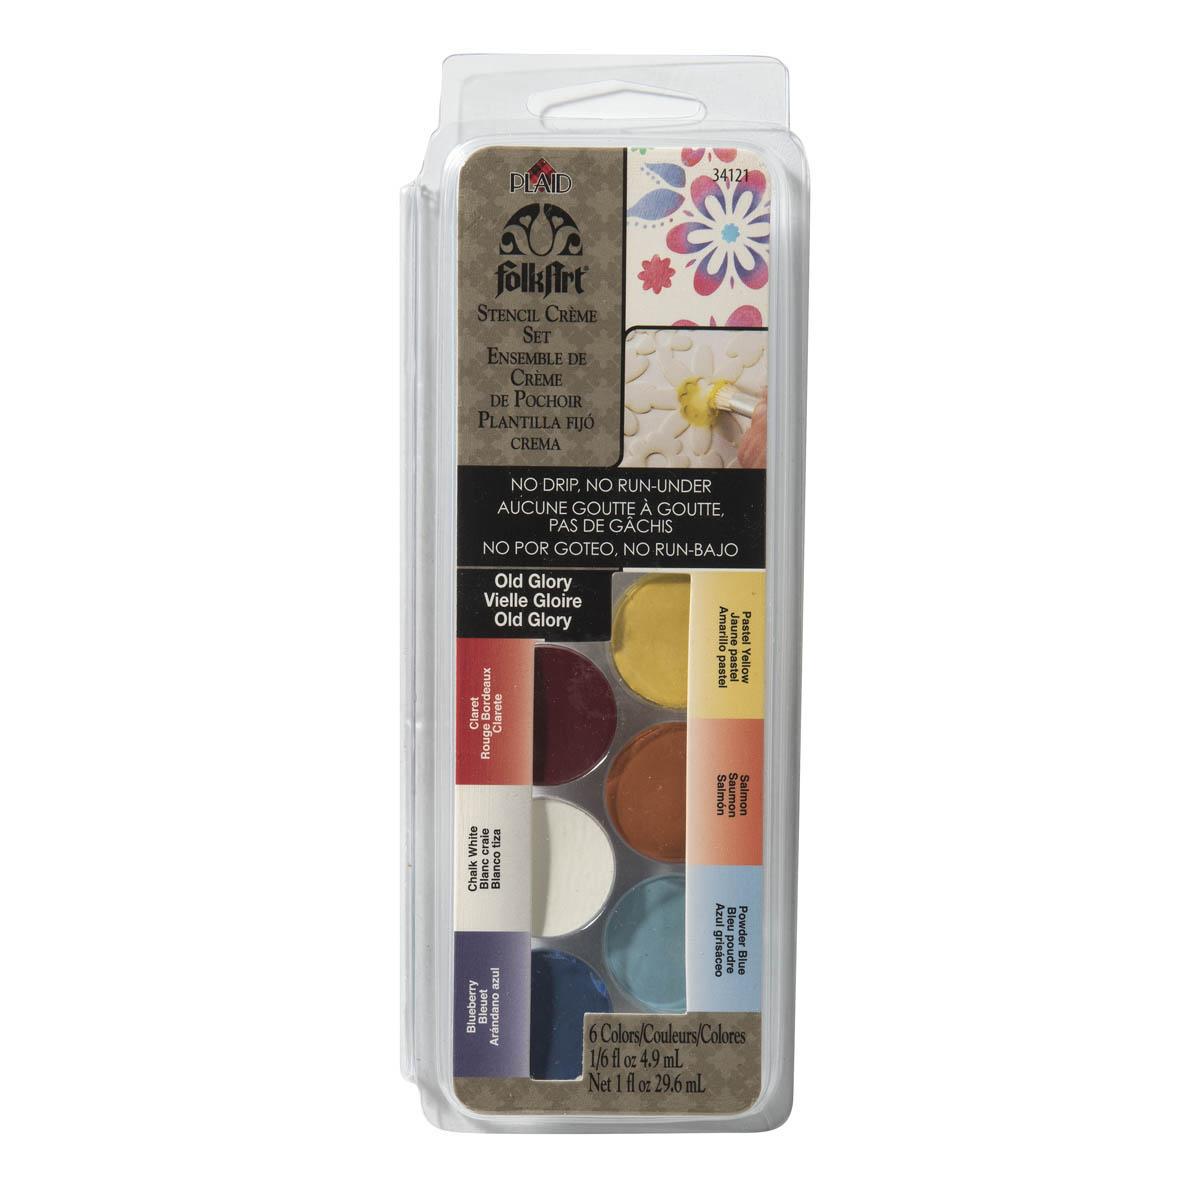 FolkArt ® Dry Brush Stencil Creme Set - Old Glory